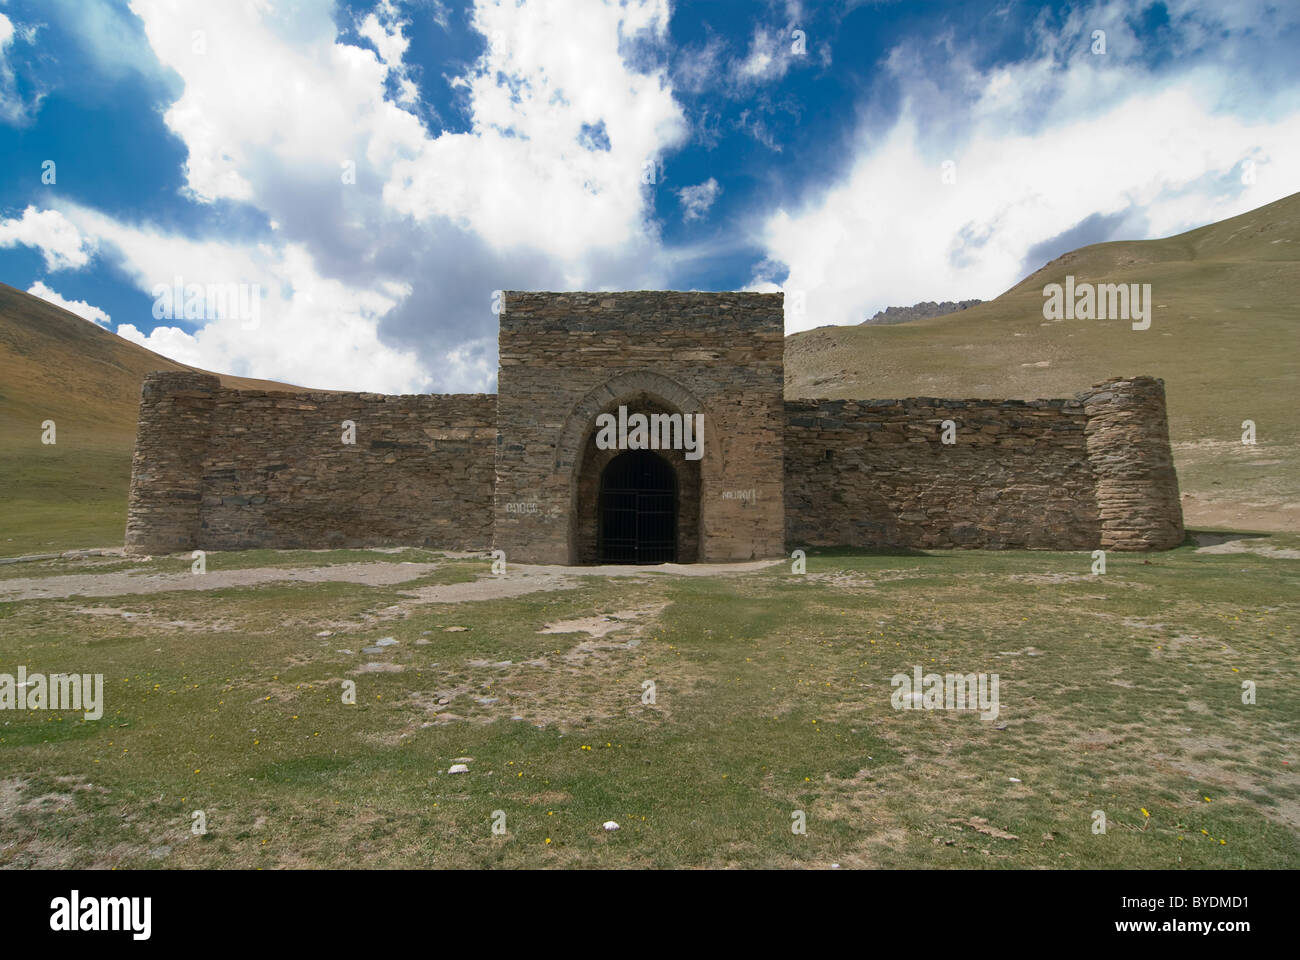 Caravanserai, stone house, Tash Rabat, Kyrgyzstan, Central Asia Stock Photo